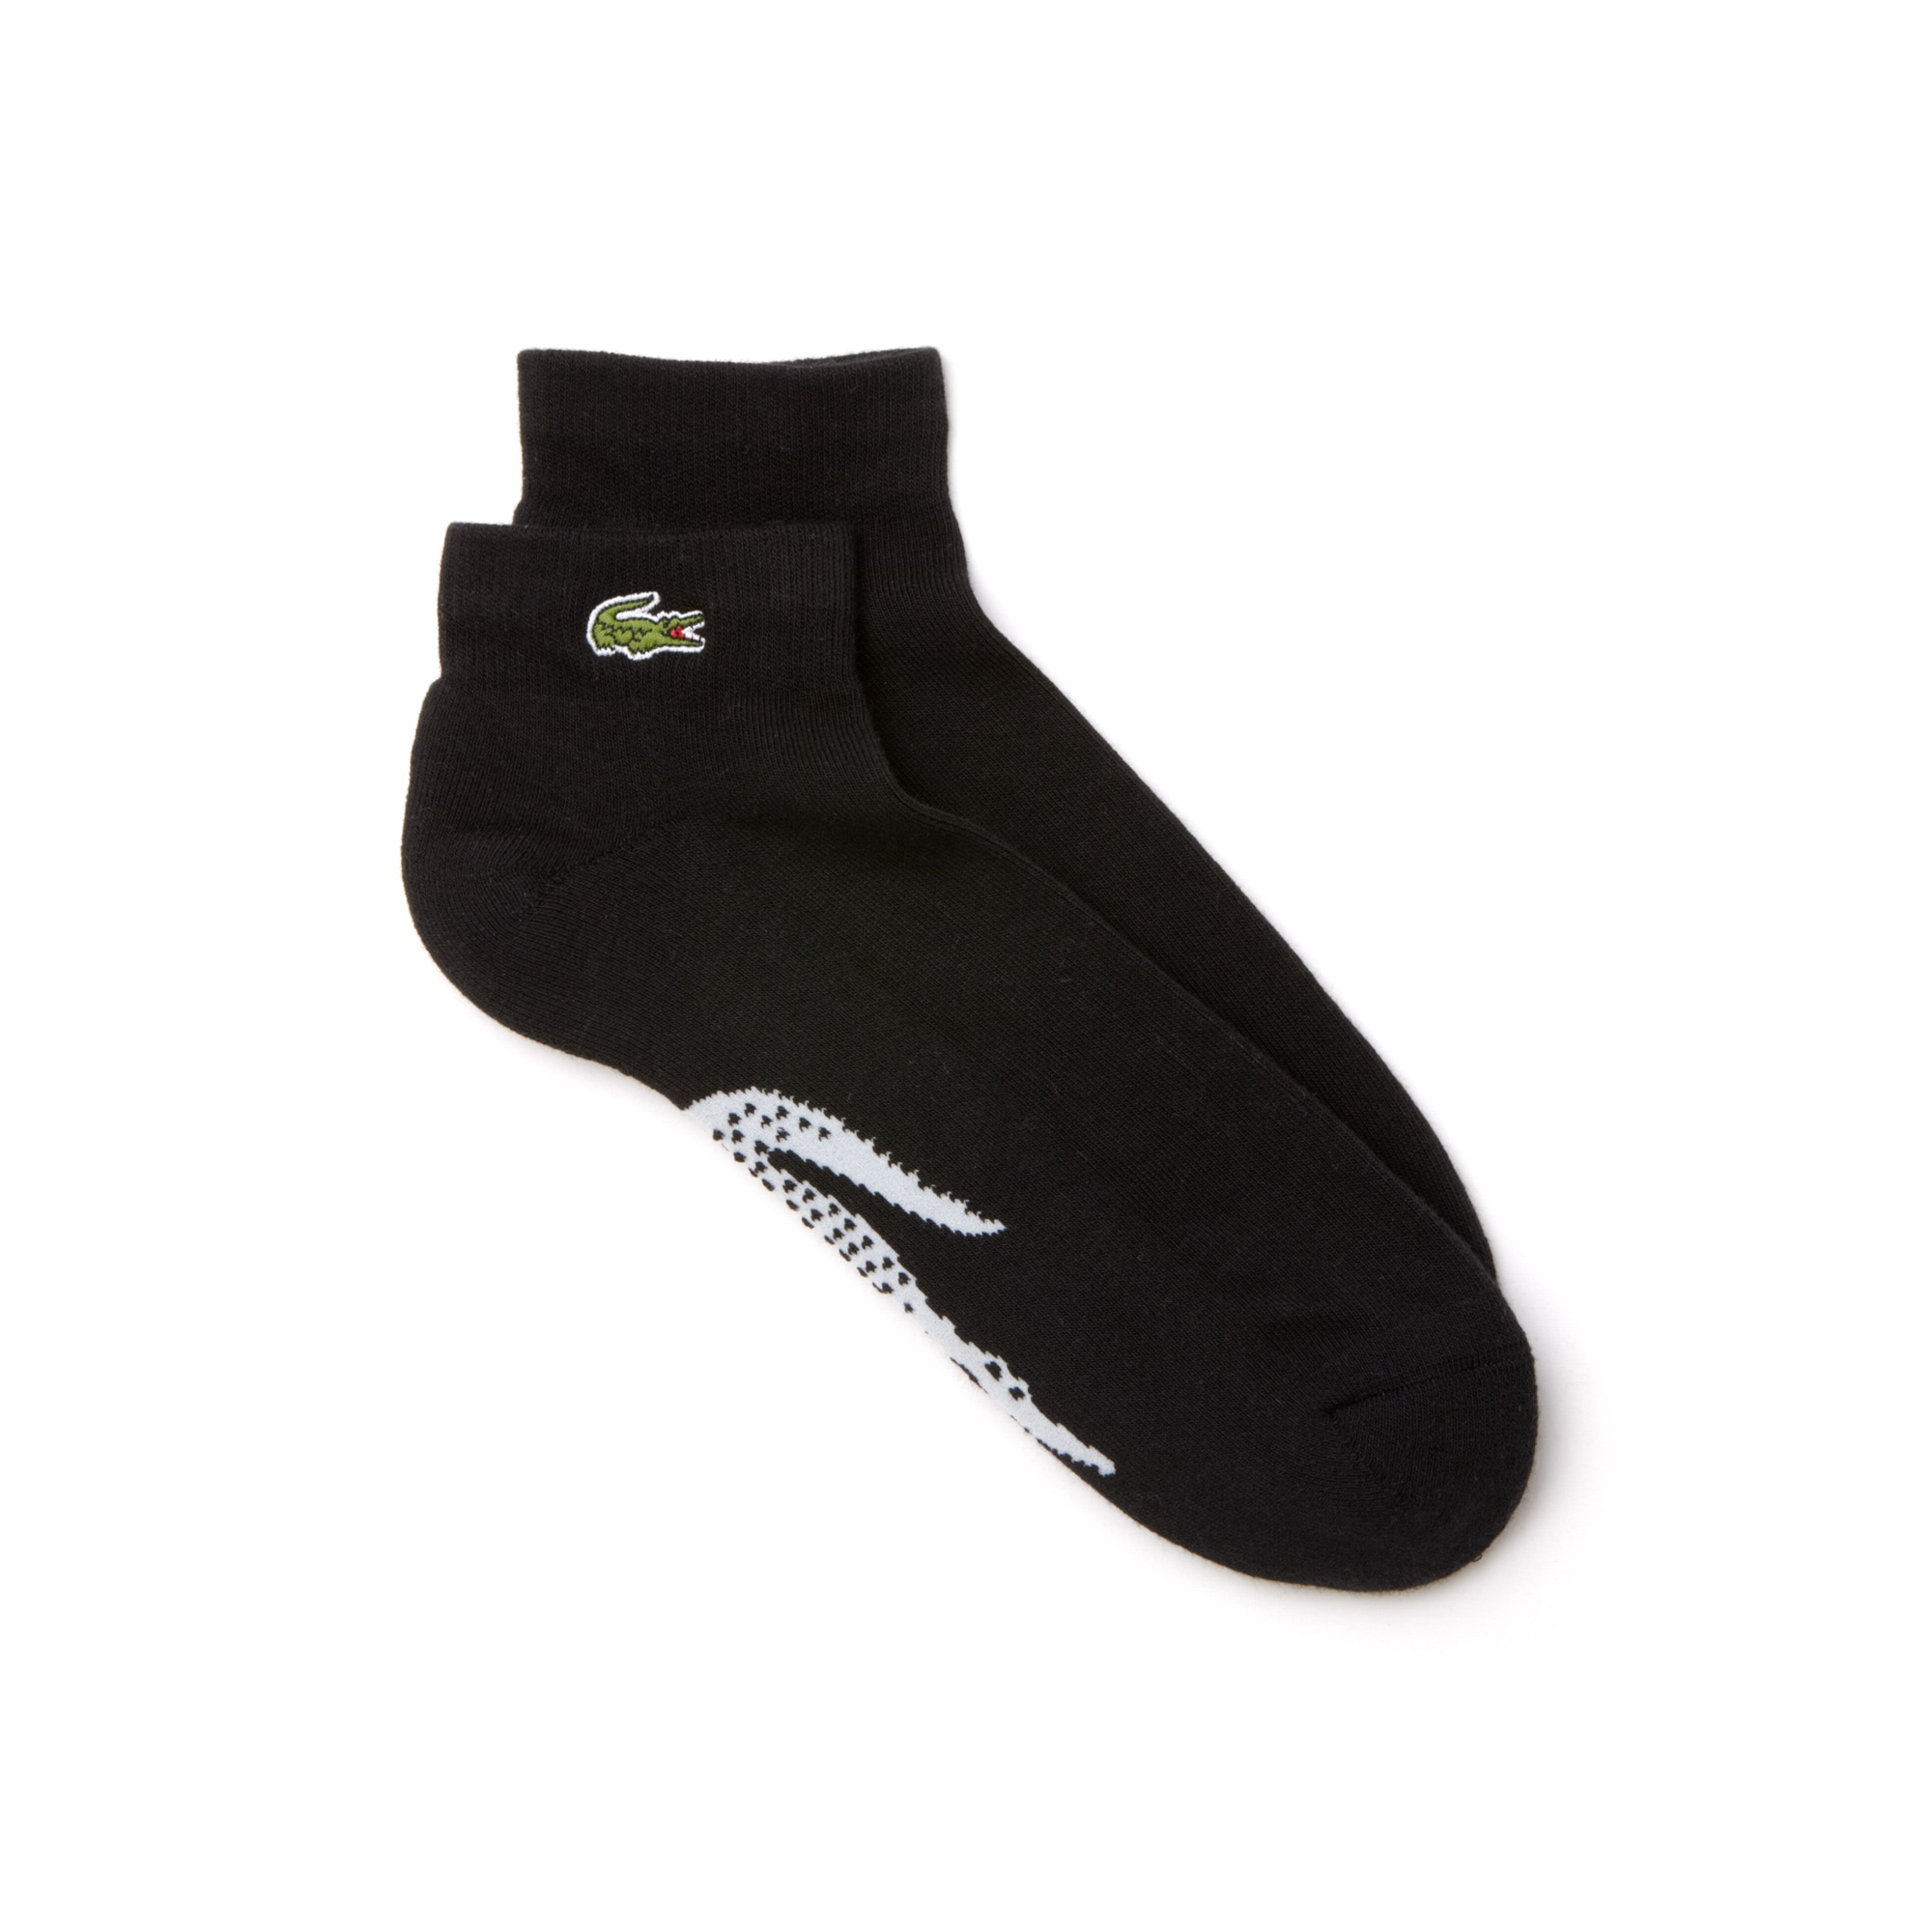 Herren-Socken aus Frottee mit XL-Krokodil LACOSTE SPORT TENNIS